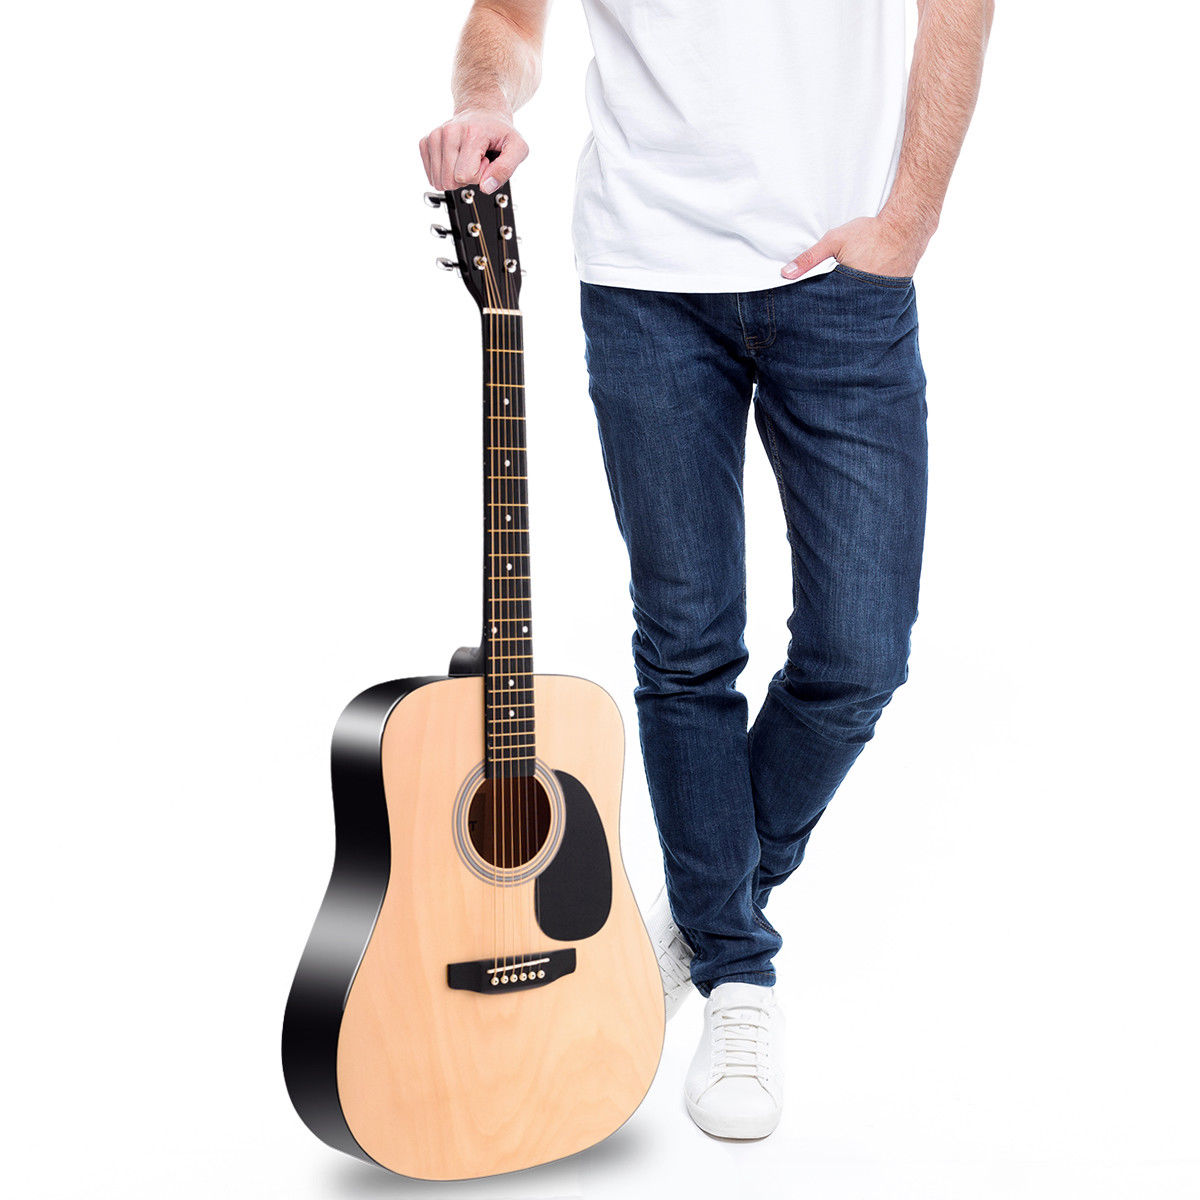 "Sonart 41"" Acoustic Folk Guitar 6 String w/ Case Strap Pick Strings Beginners - image 3 of 10"